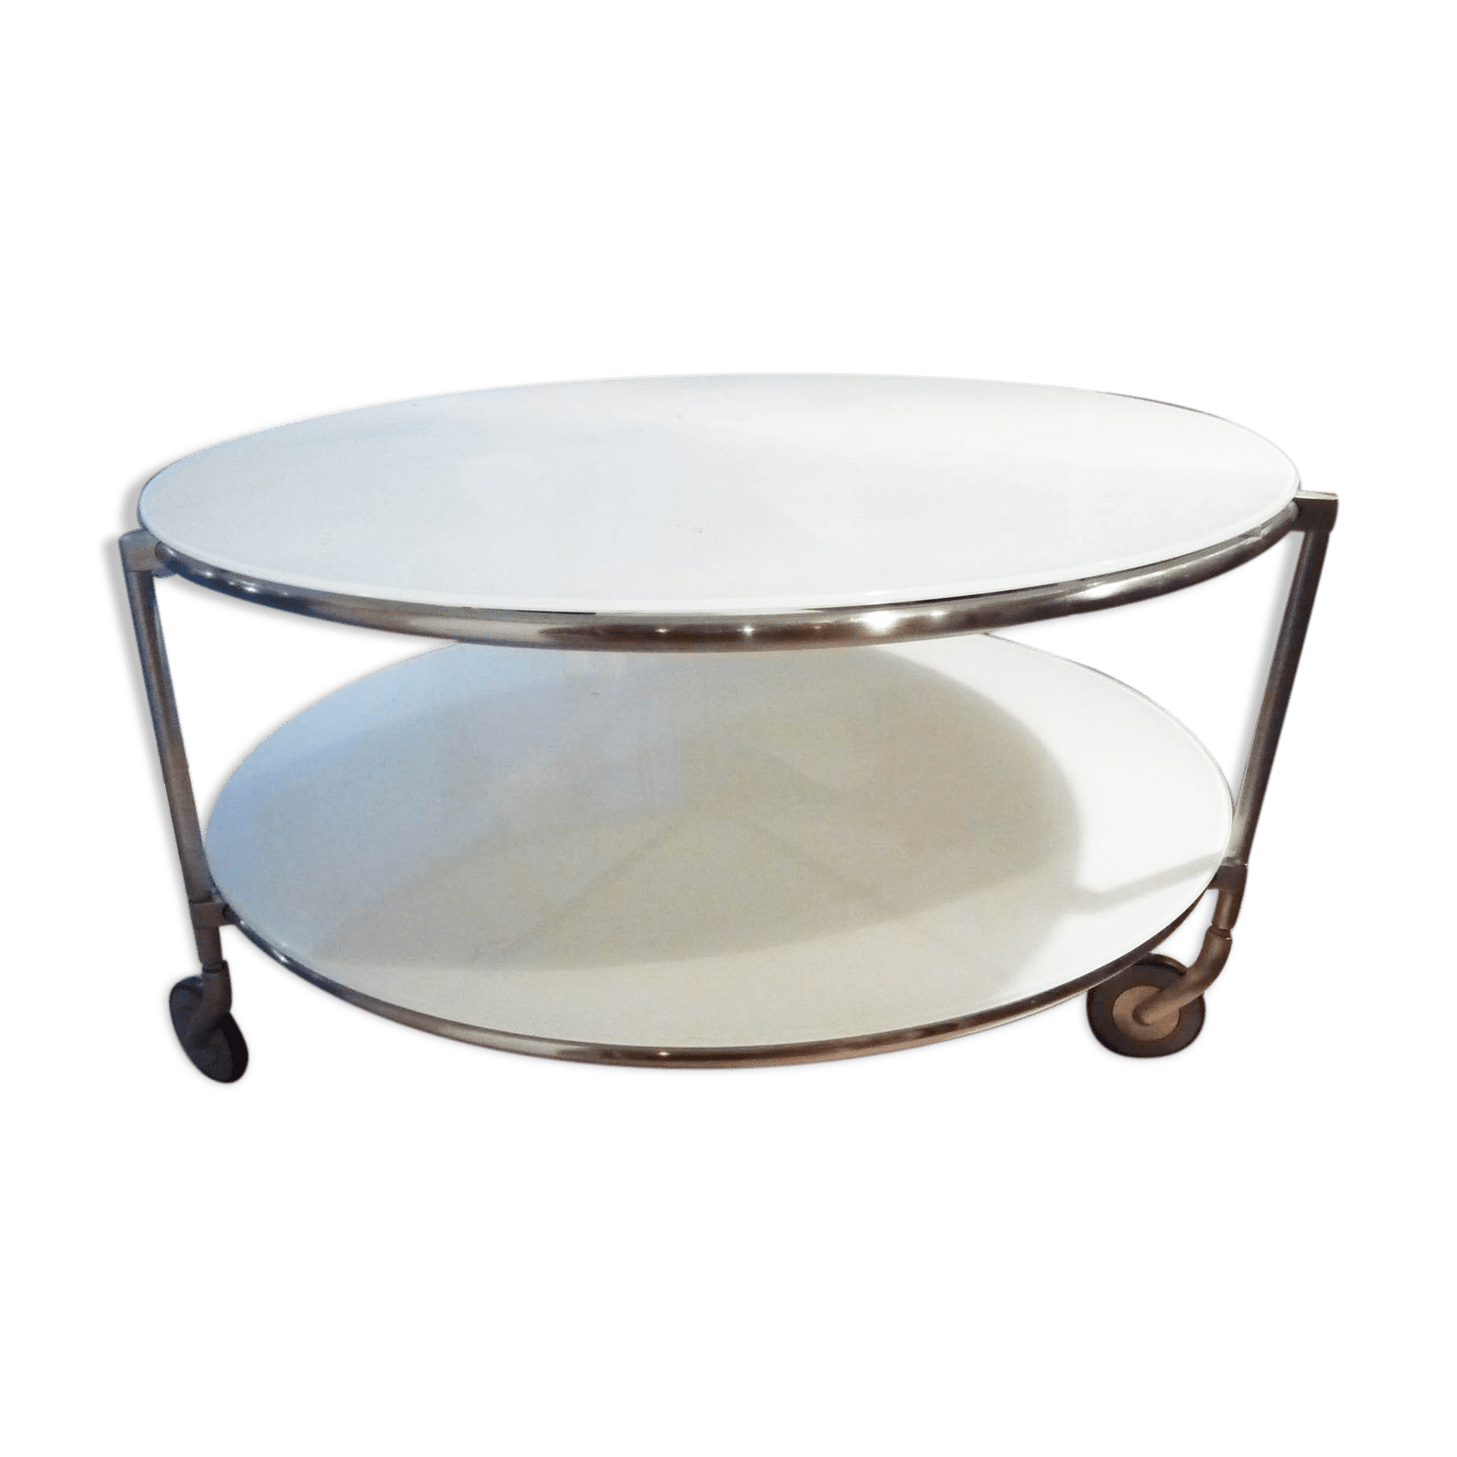 Table Basse Ikea Modèle Strind Métal Blanc Design